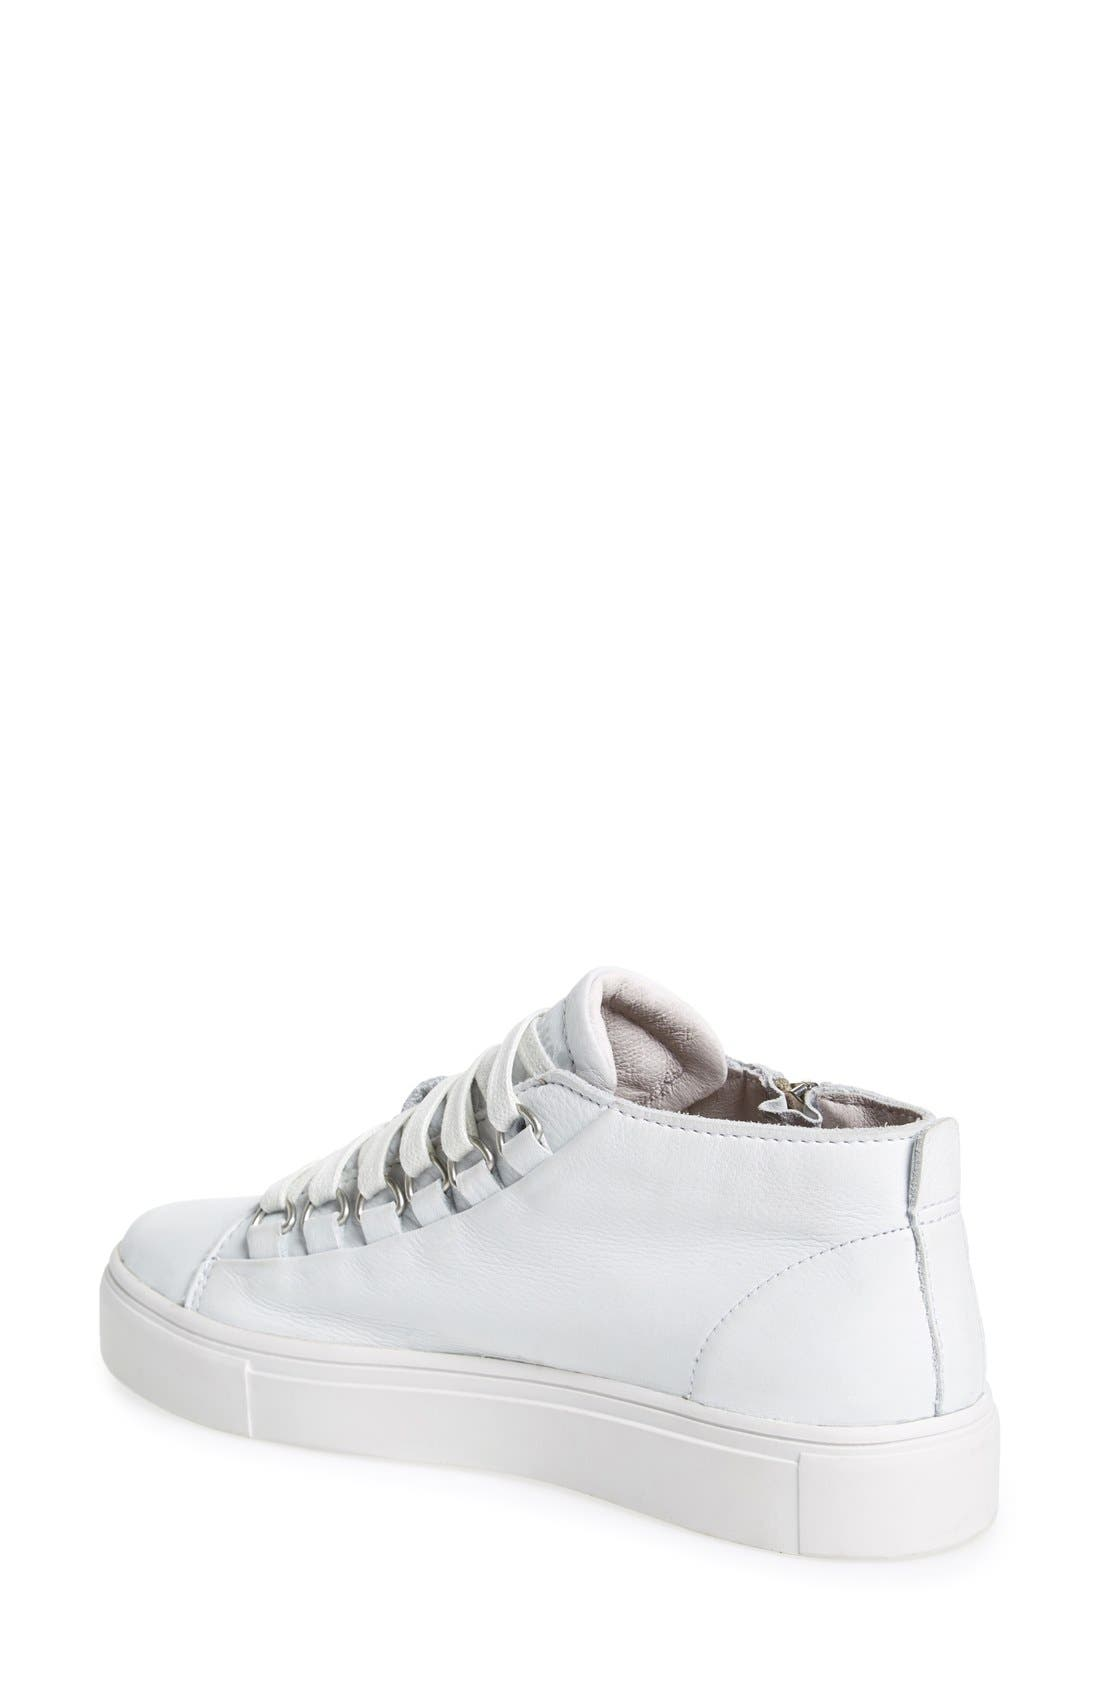 BLACKSTONE, 'LL60' Midi Sneaker, Alternate thumbnail 3, color, WHITE LEATHER